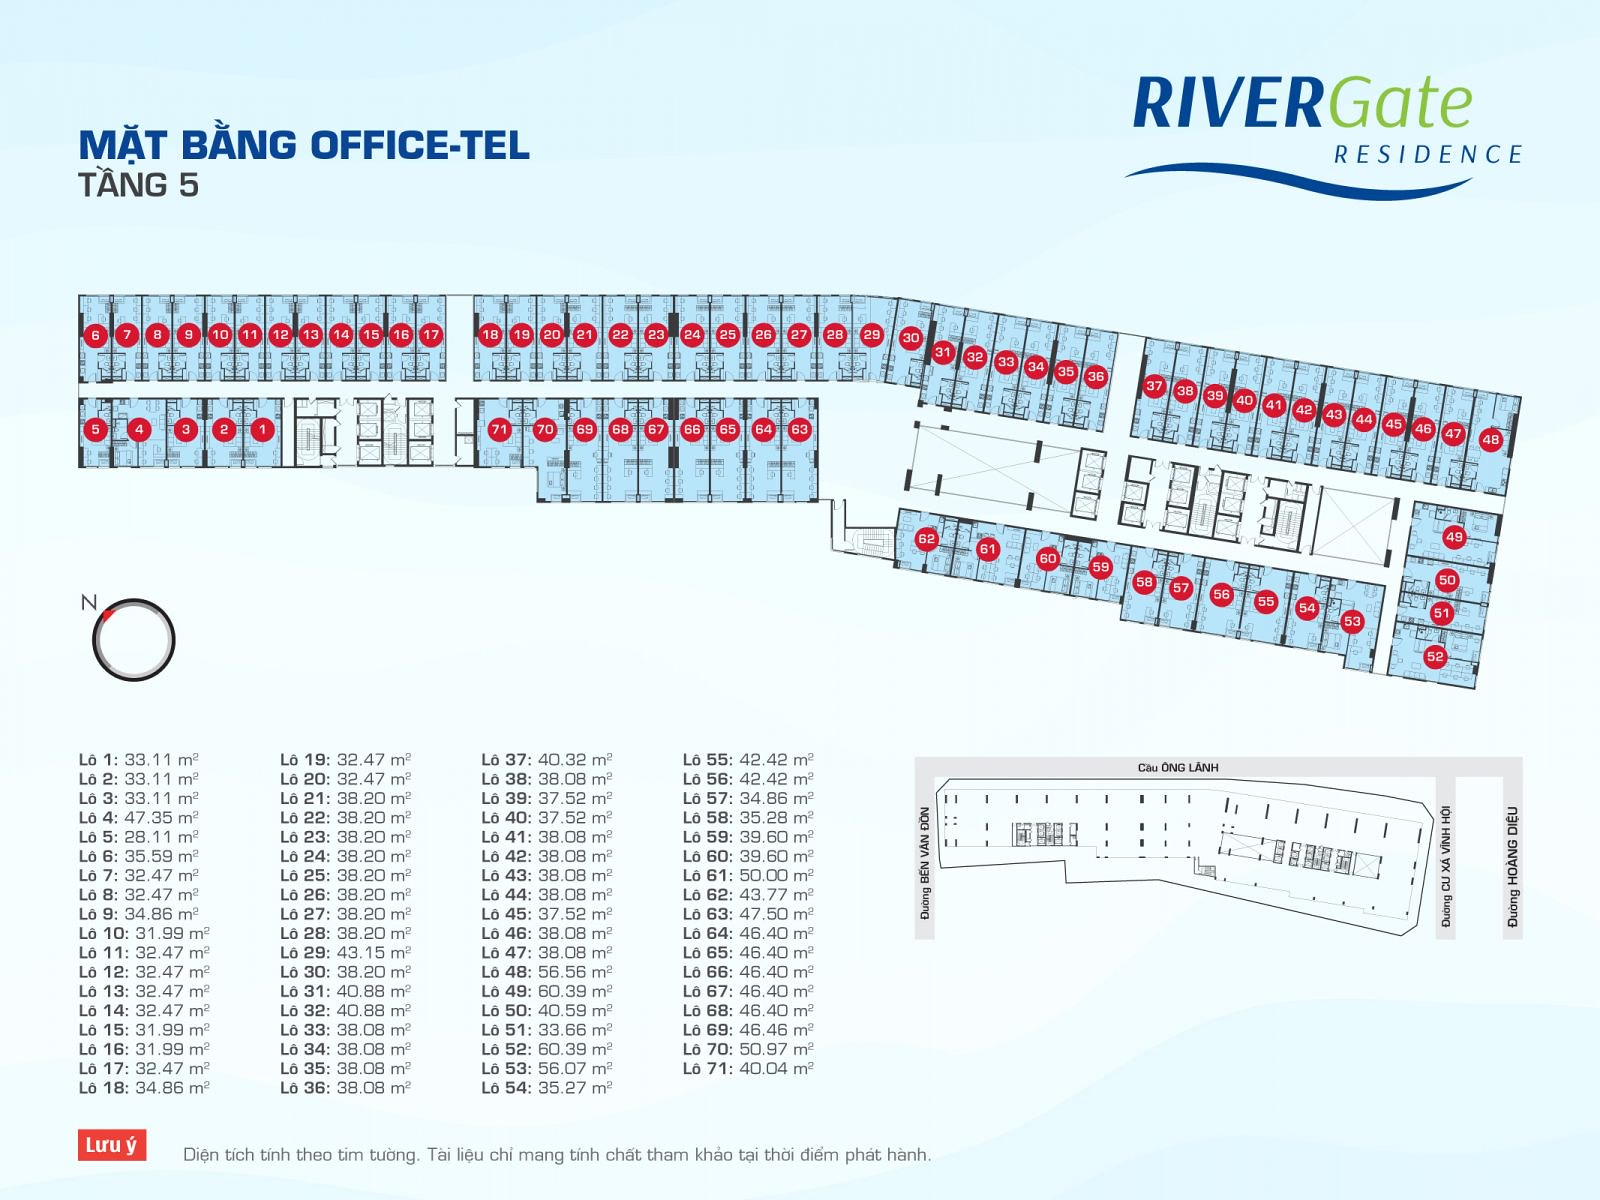 Mặt bằng OfficeTel RiverGate tầng 5